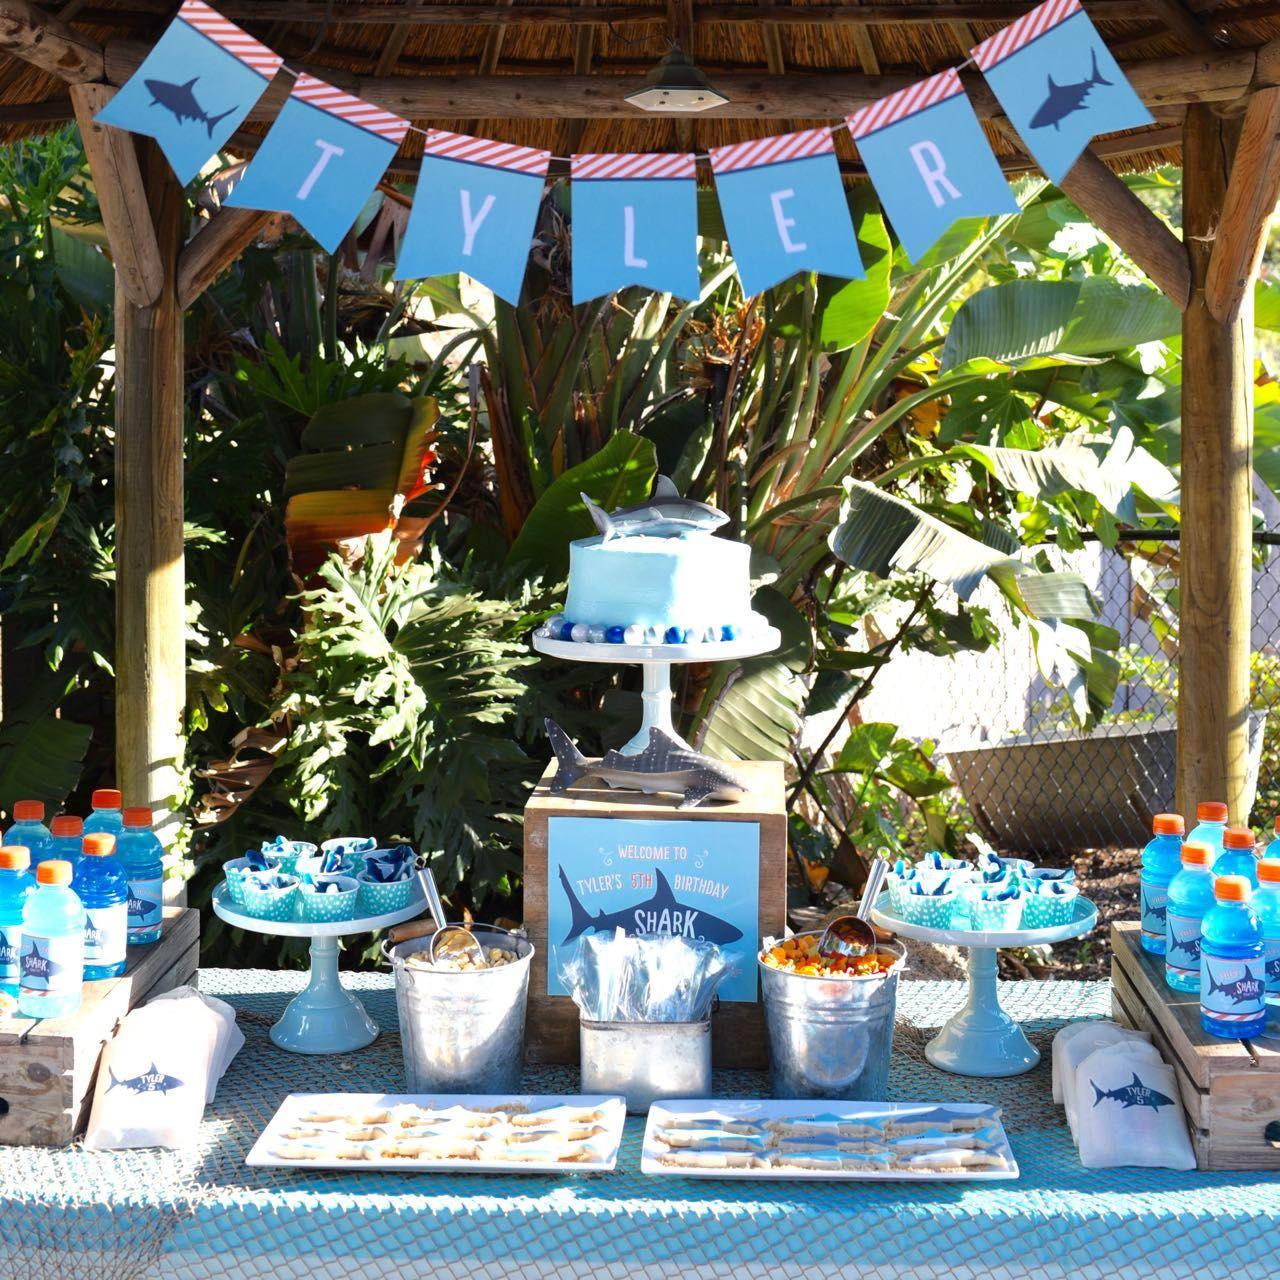 Shark Birthday Party Fun Birthday Party At Park Boy